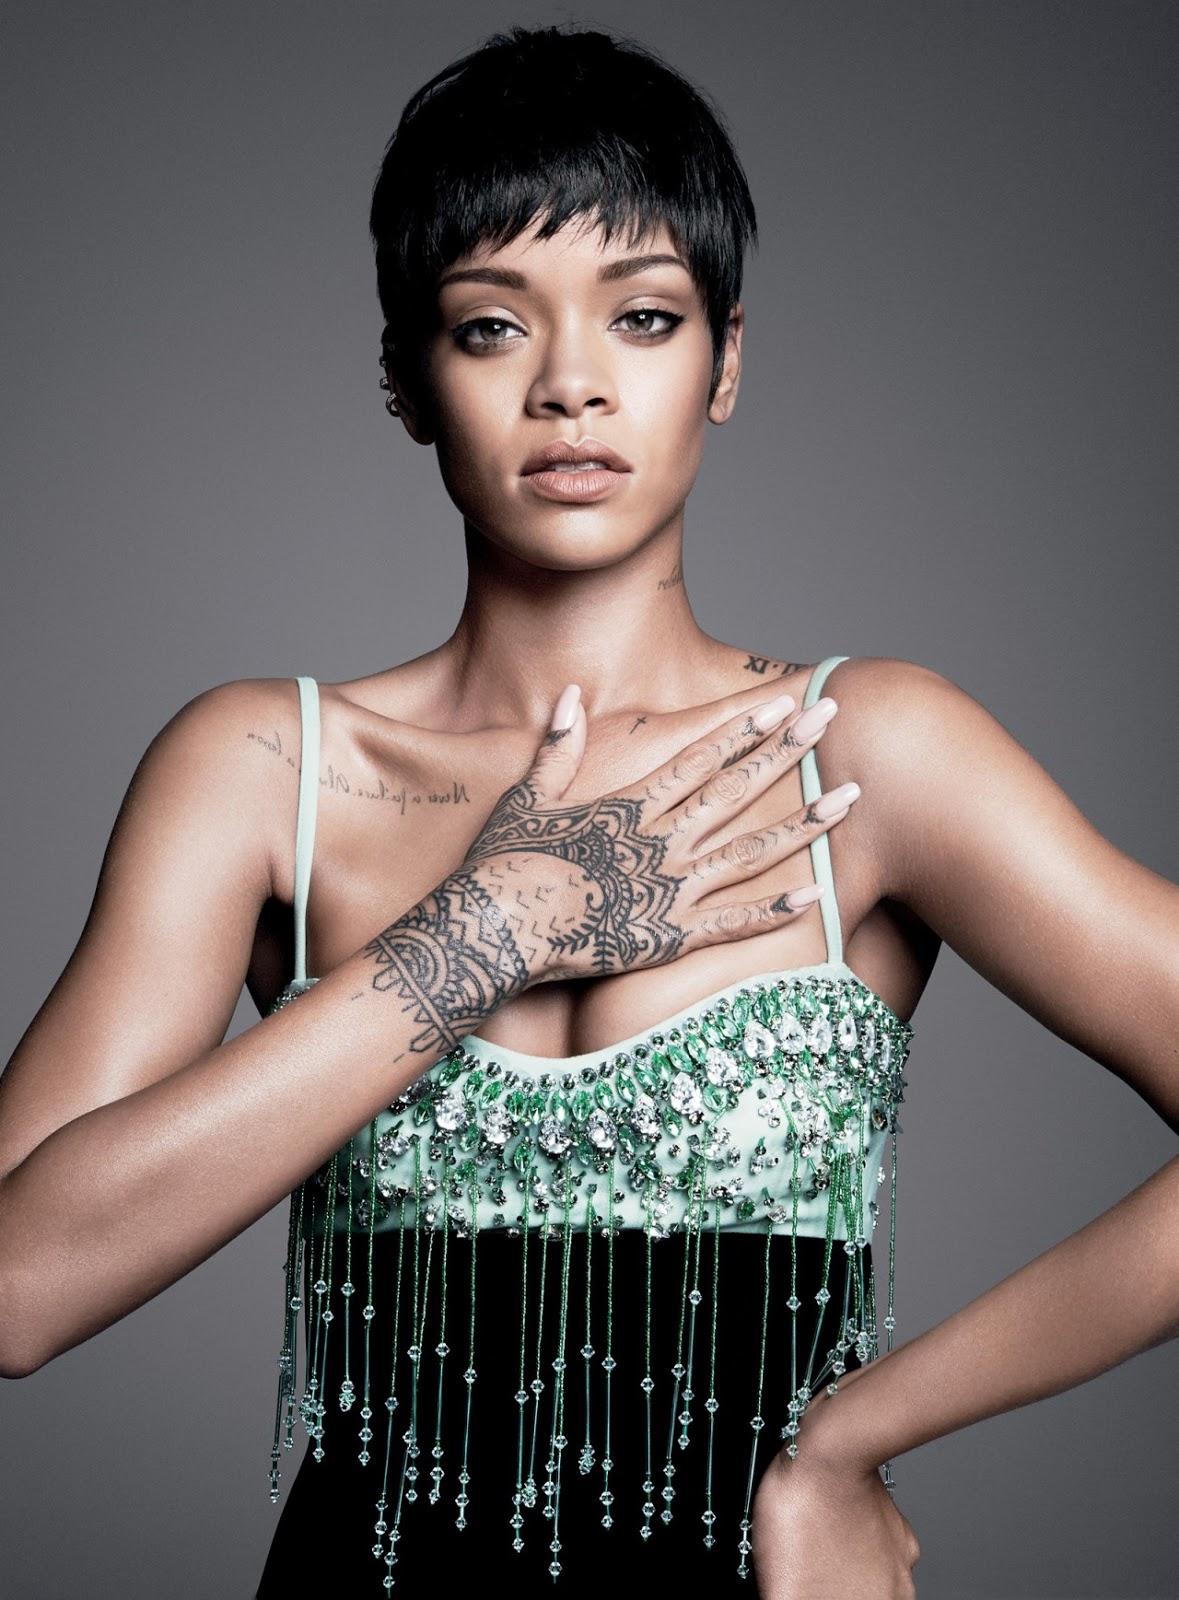 Awesome Rihanna Tattoos Designs